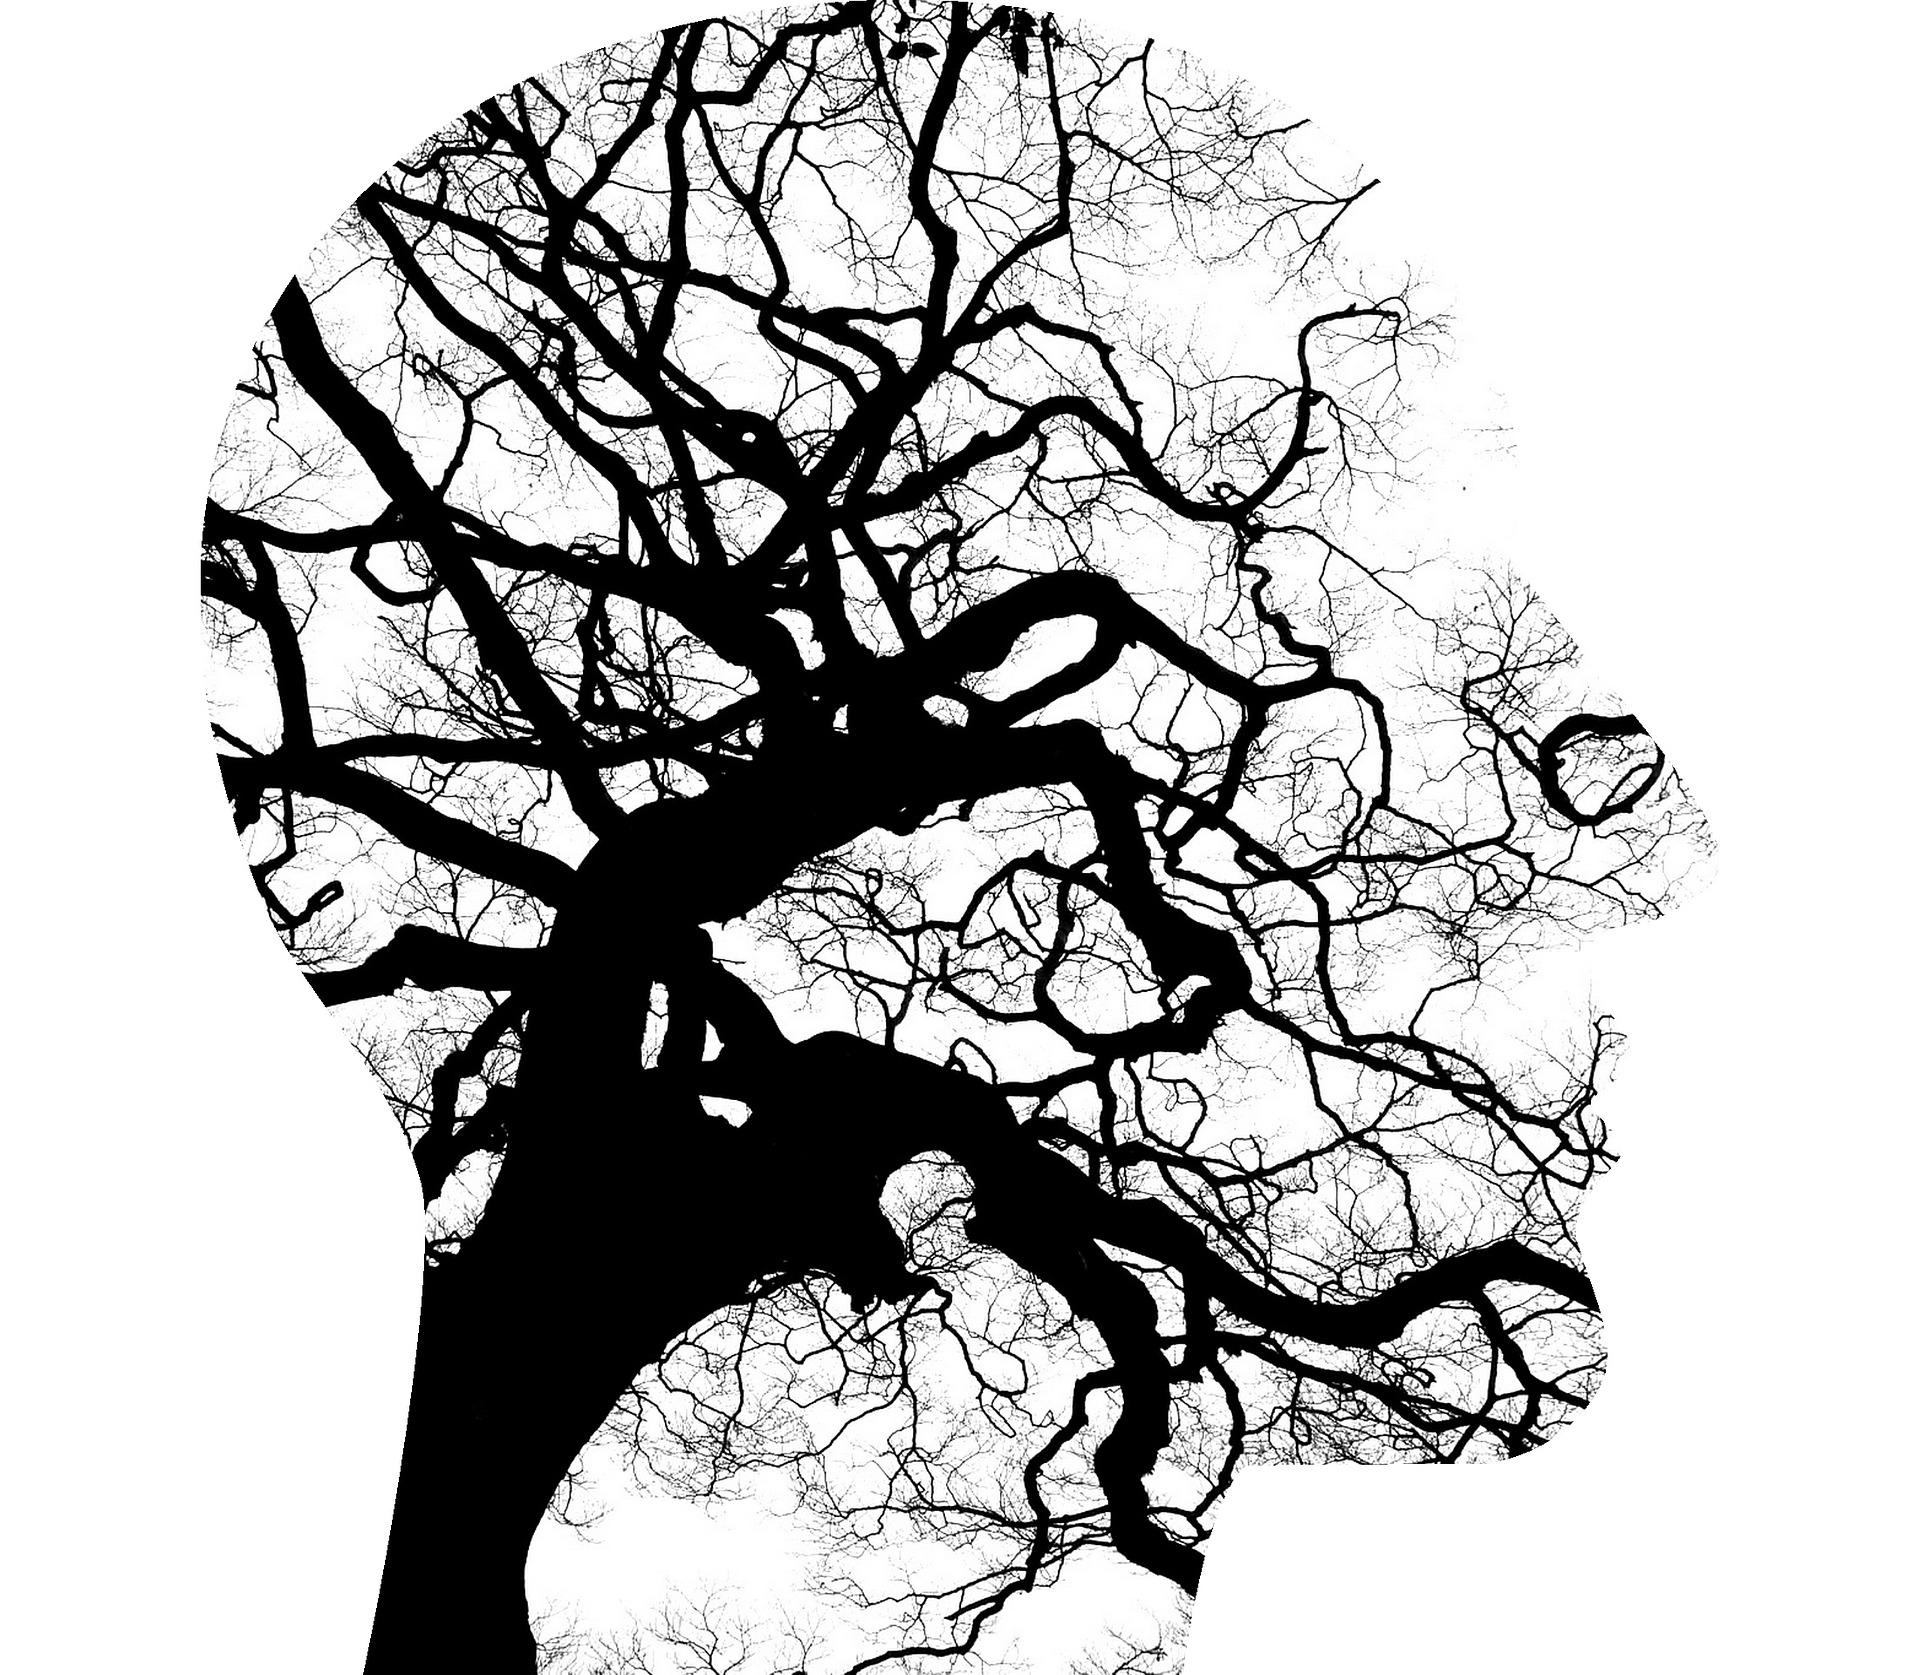 human-brain-like-tree